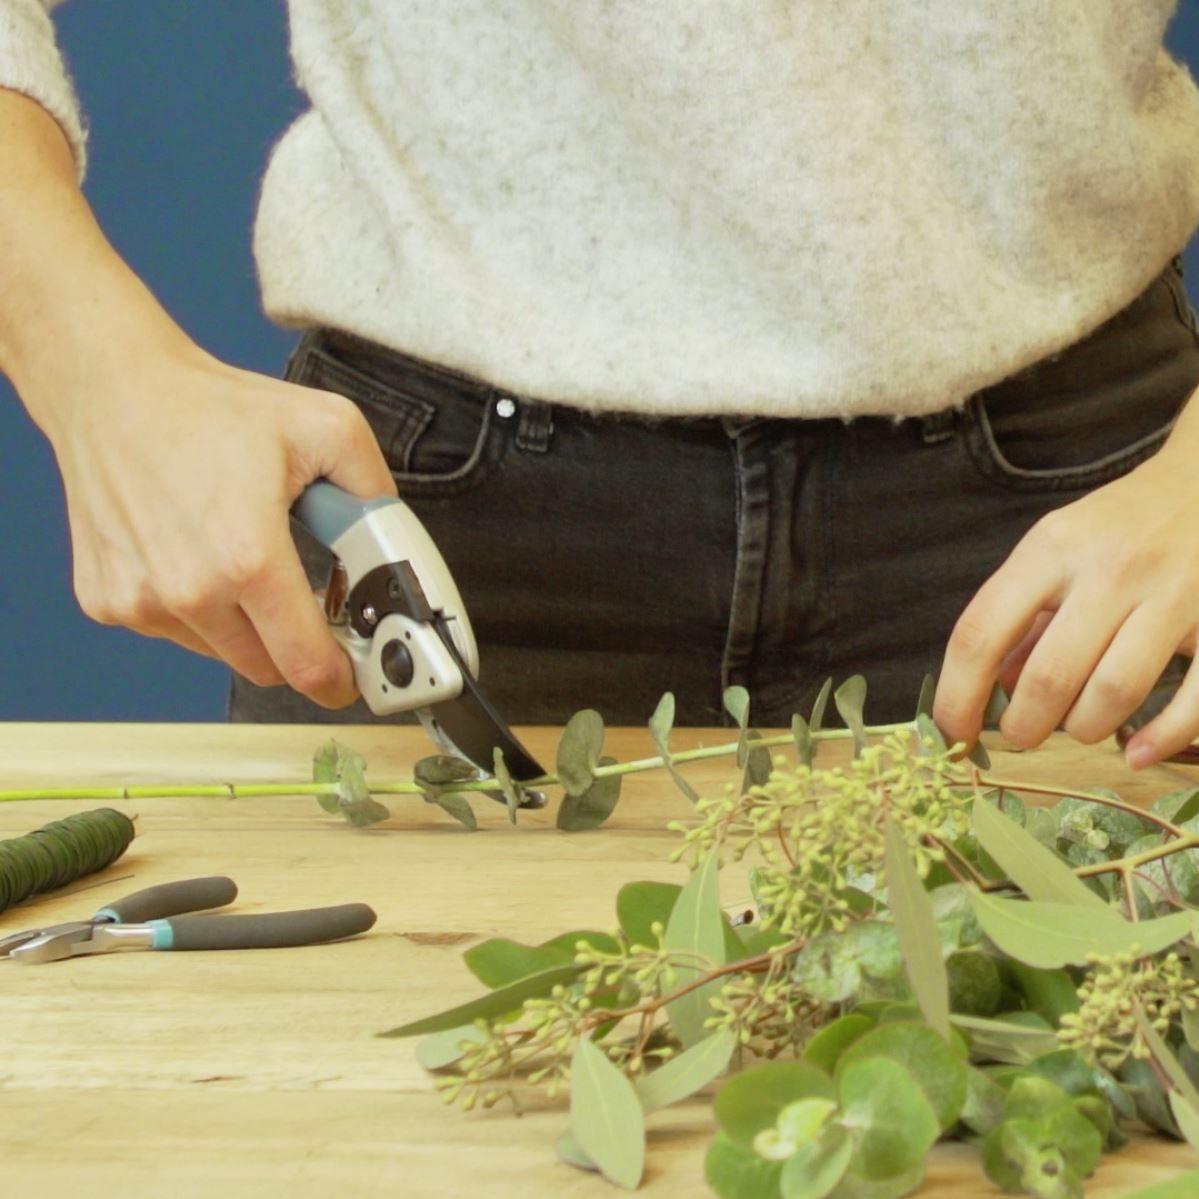 DIY Driehoek met eucalyptus takken. stap 2: Eucalyptus knippen